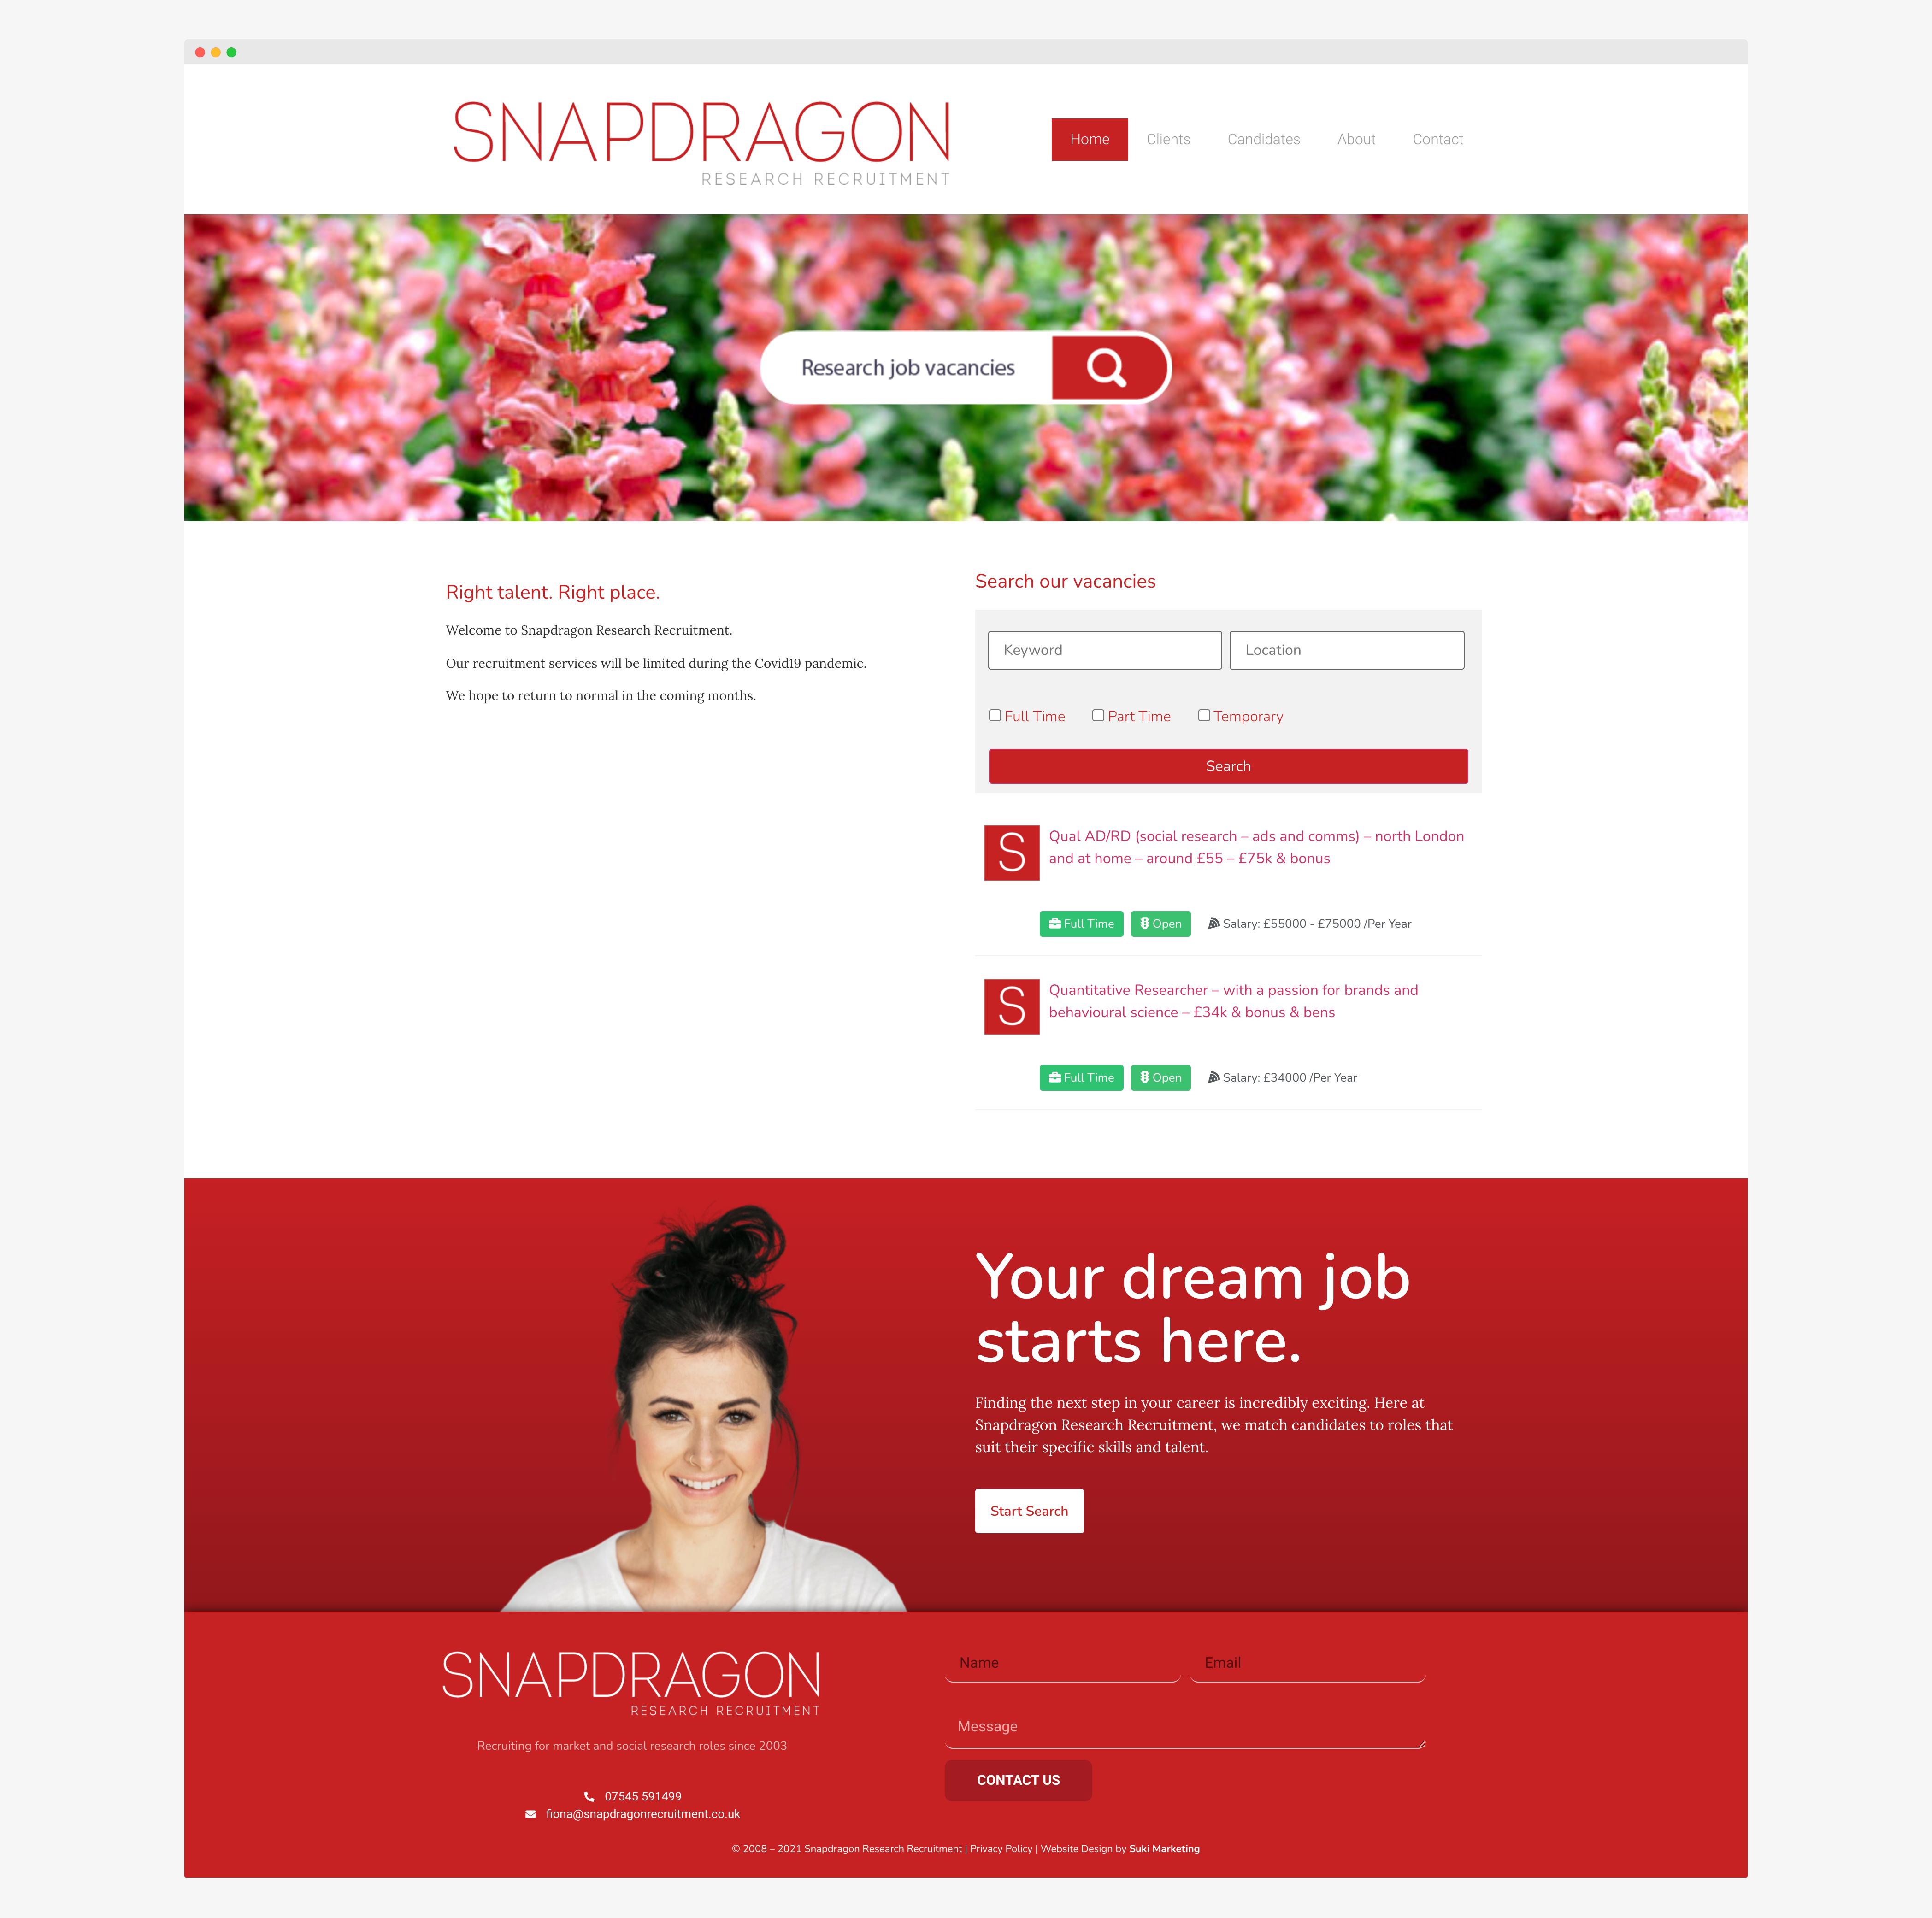 Snapdragon Research Recruitment Web Design